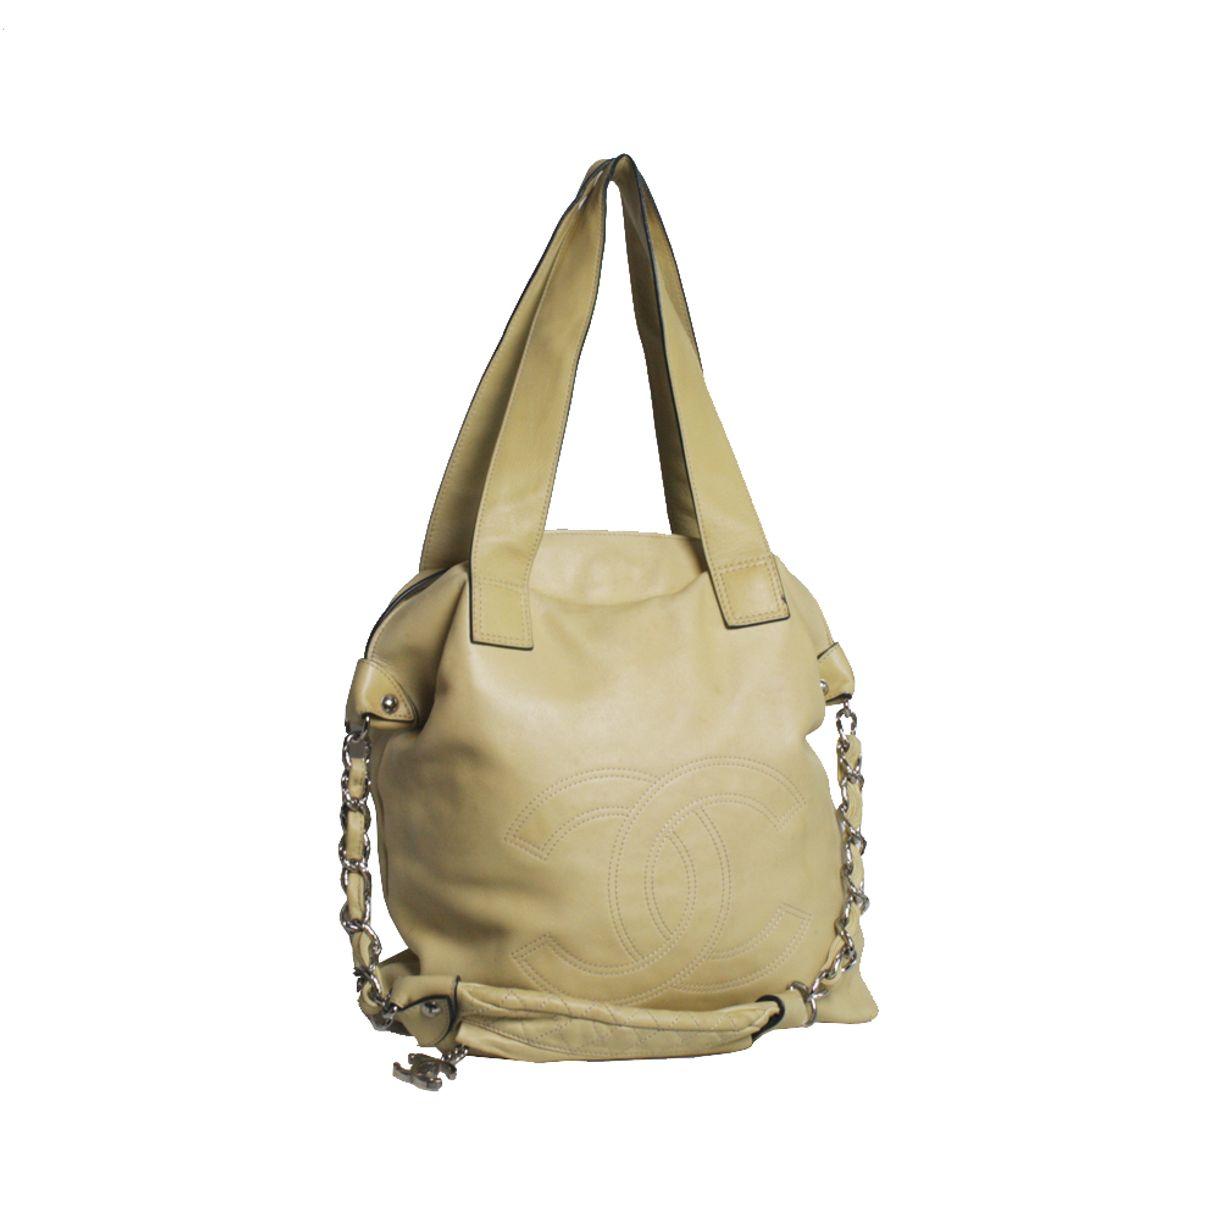 Bolsa-Chanel-Couro-Bege